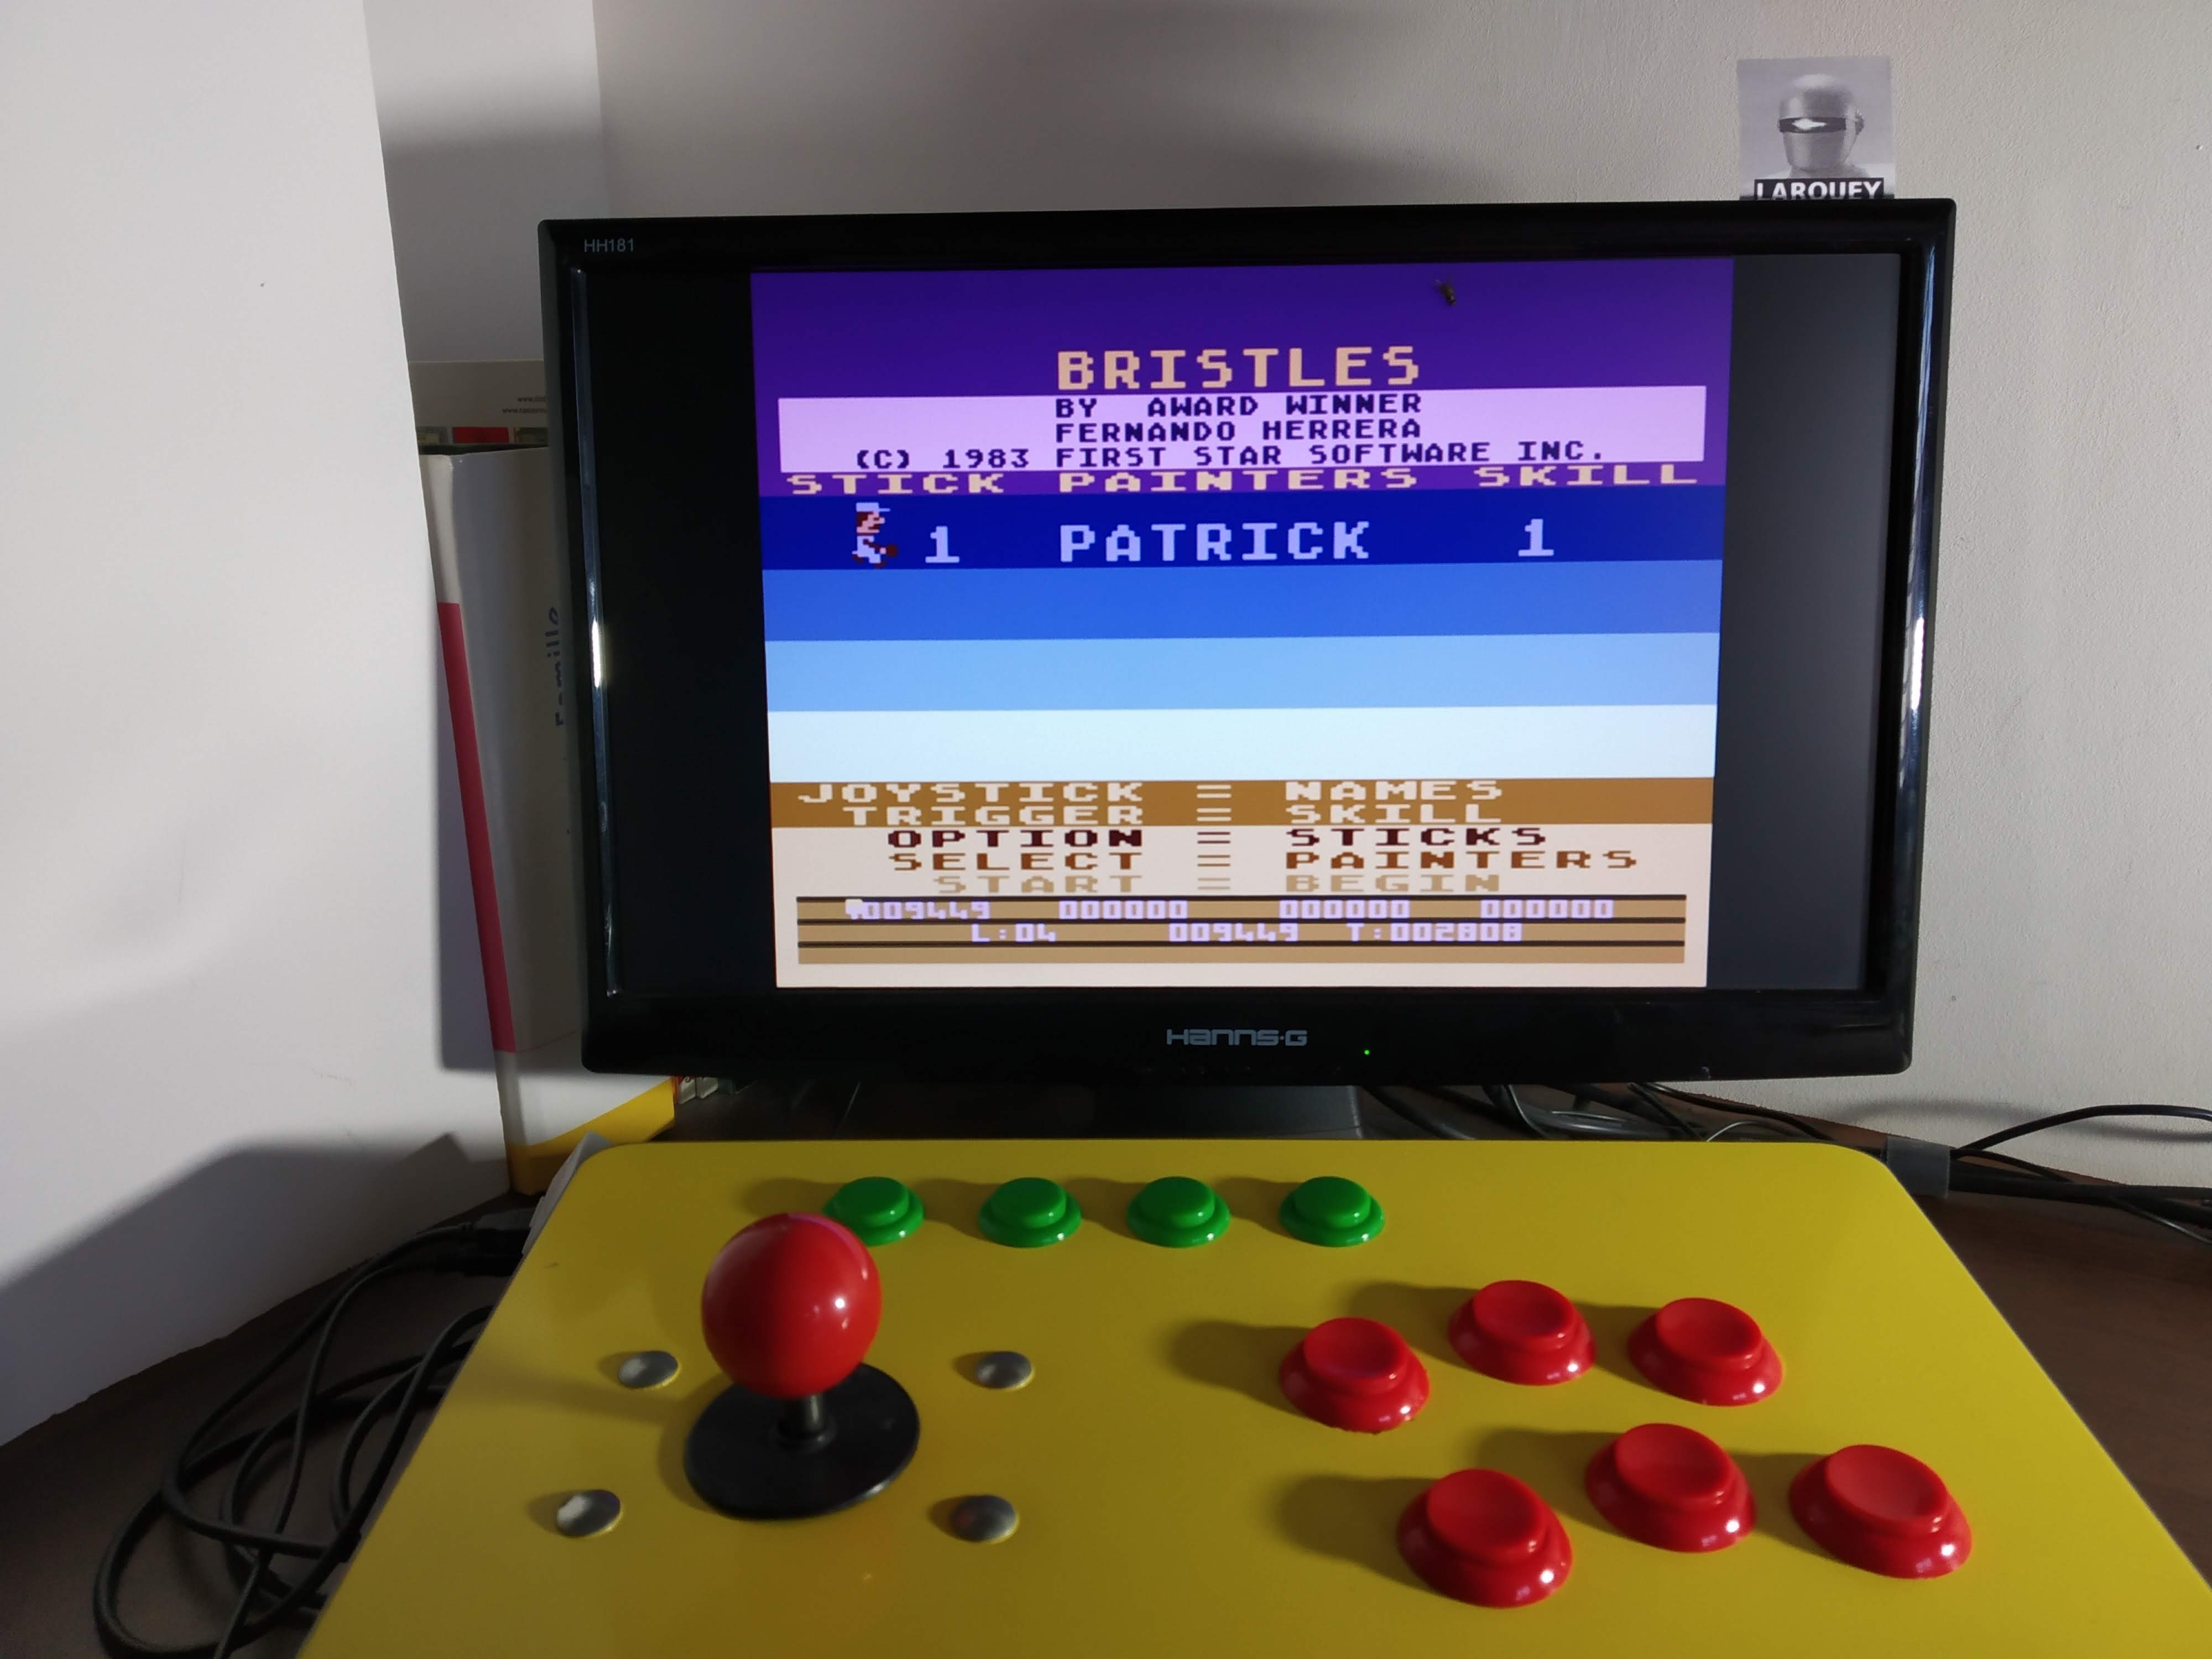 Larquey: Bristles (Atari 400/800/XL/XE Emulated) 9,449 points on 2019-12-14 10:54:06